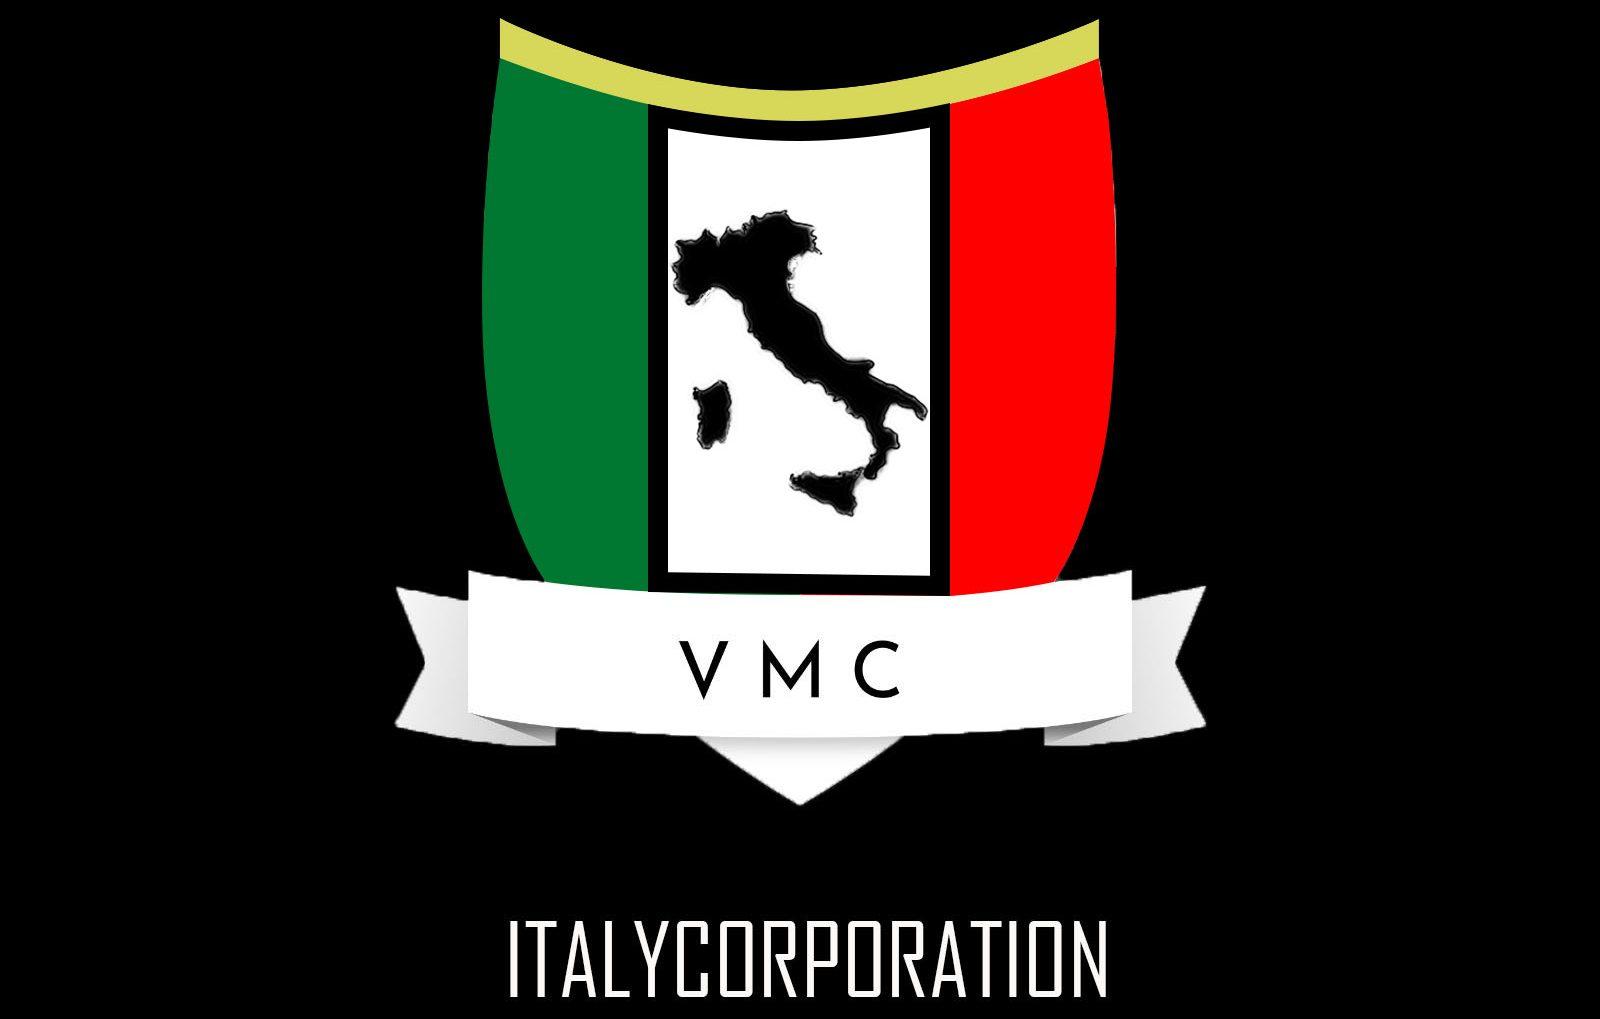 Italycorporation